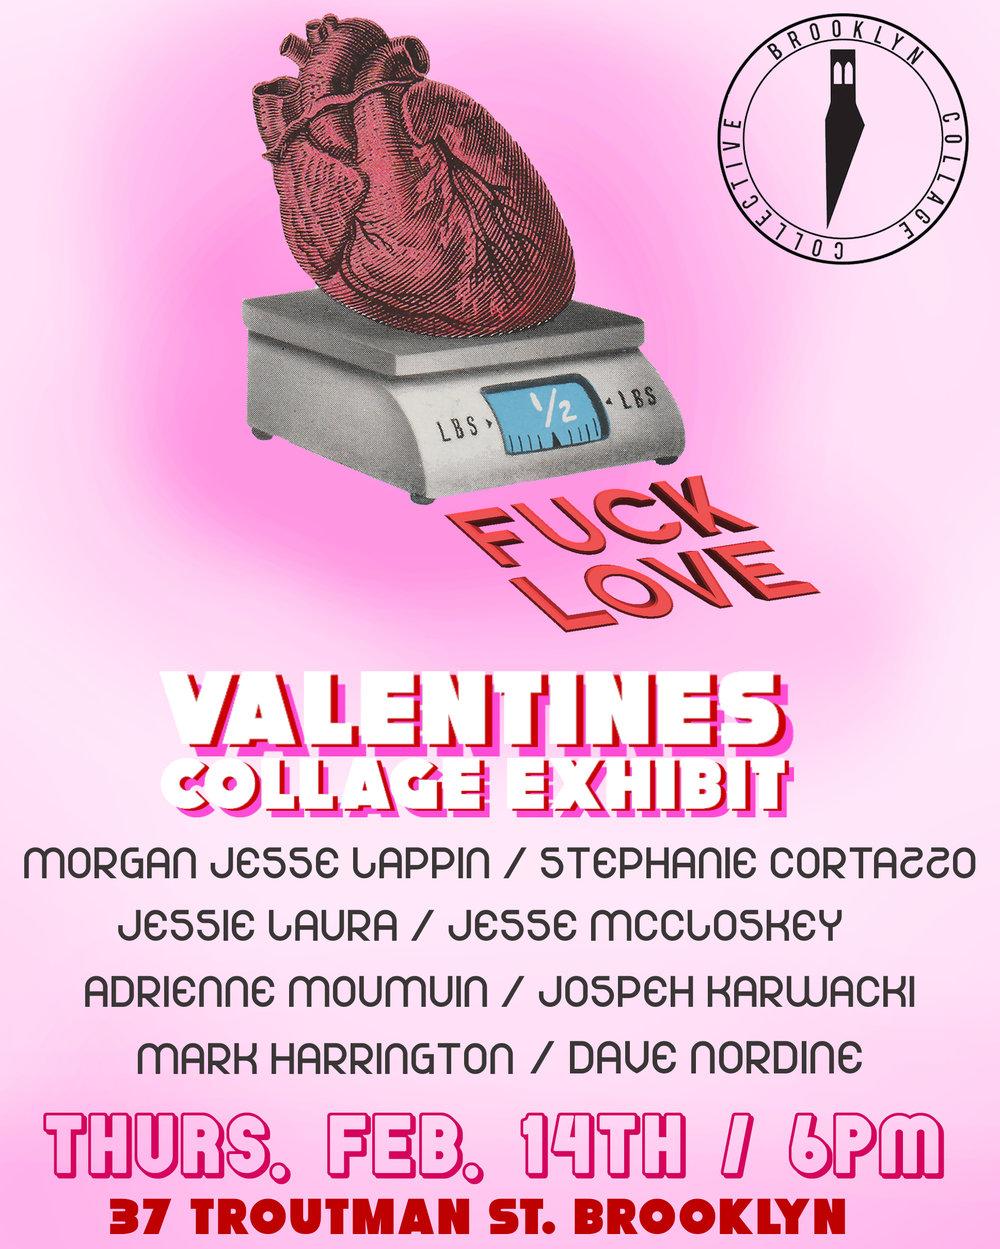 BCC Valentines 2019.jpg